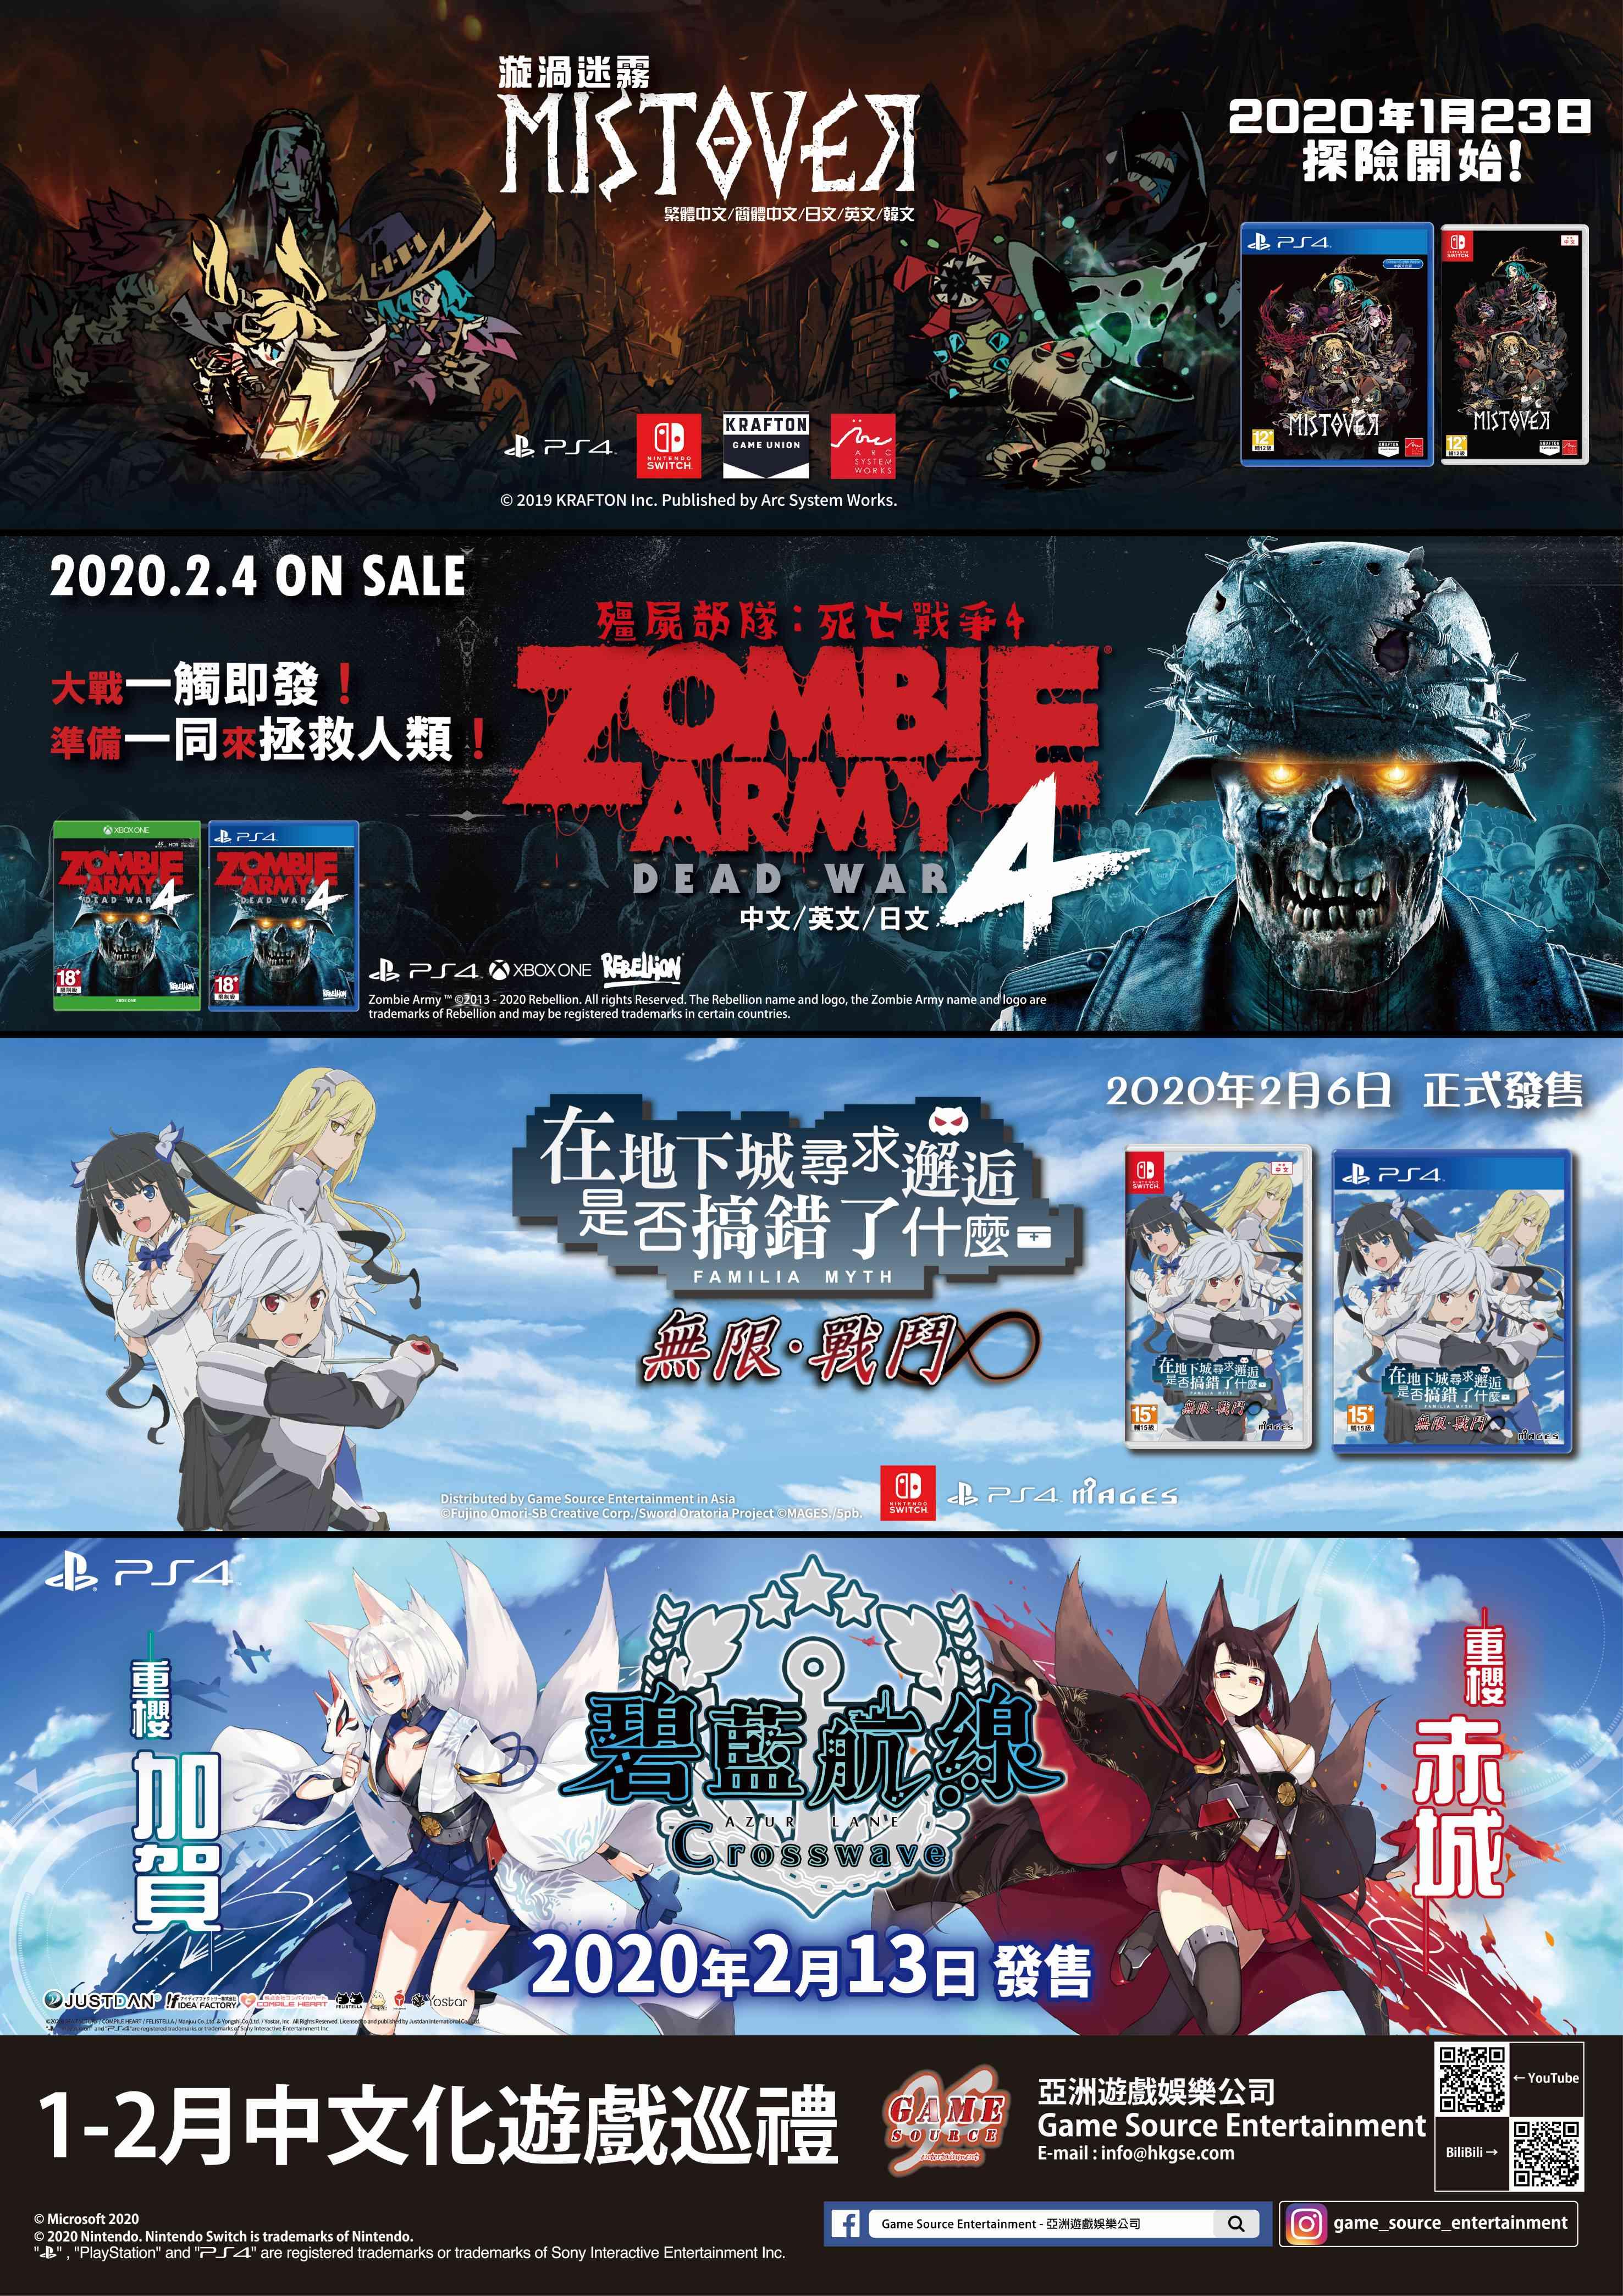 GSE 1-2月主機中文化游戲巡禮